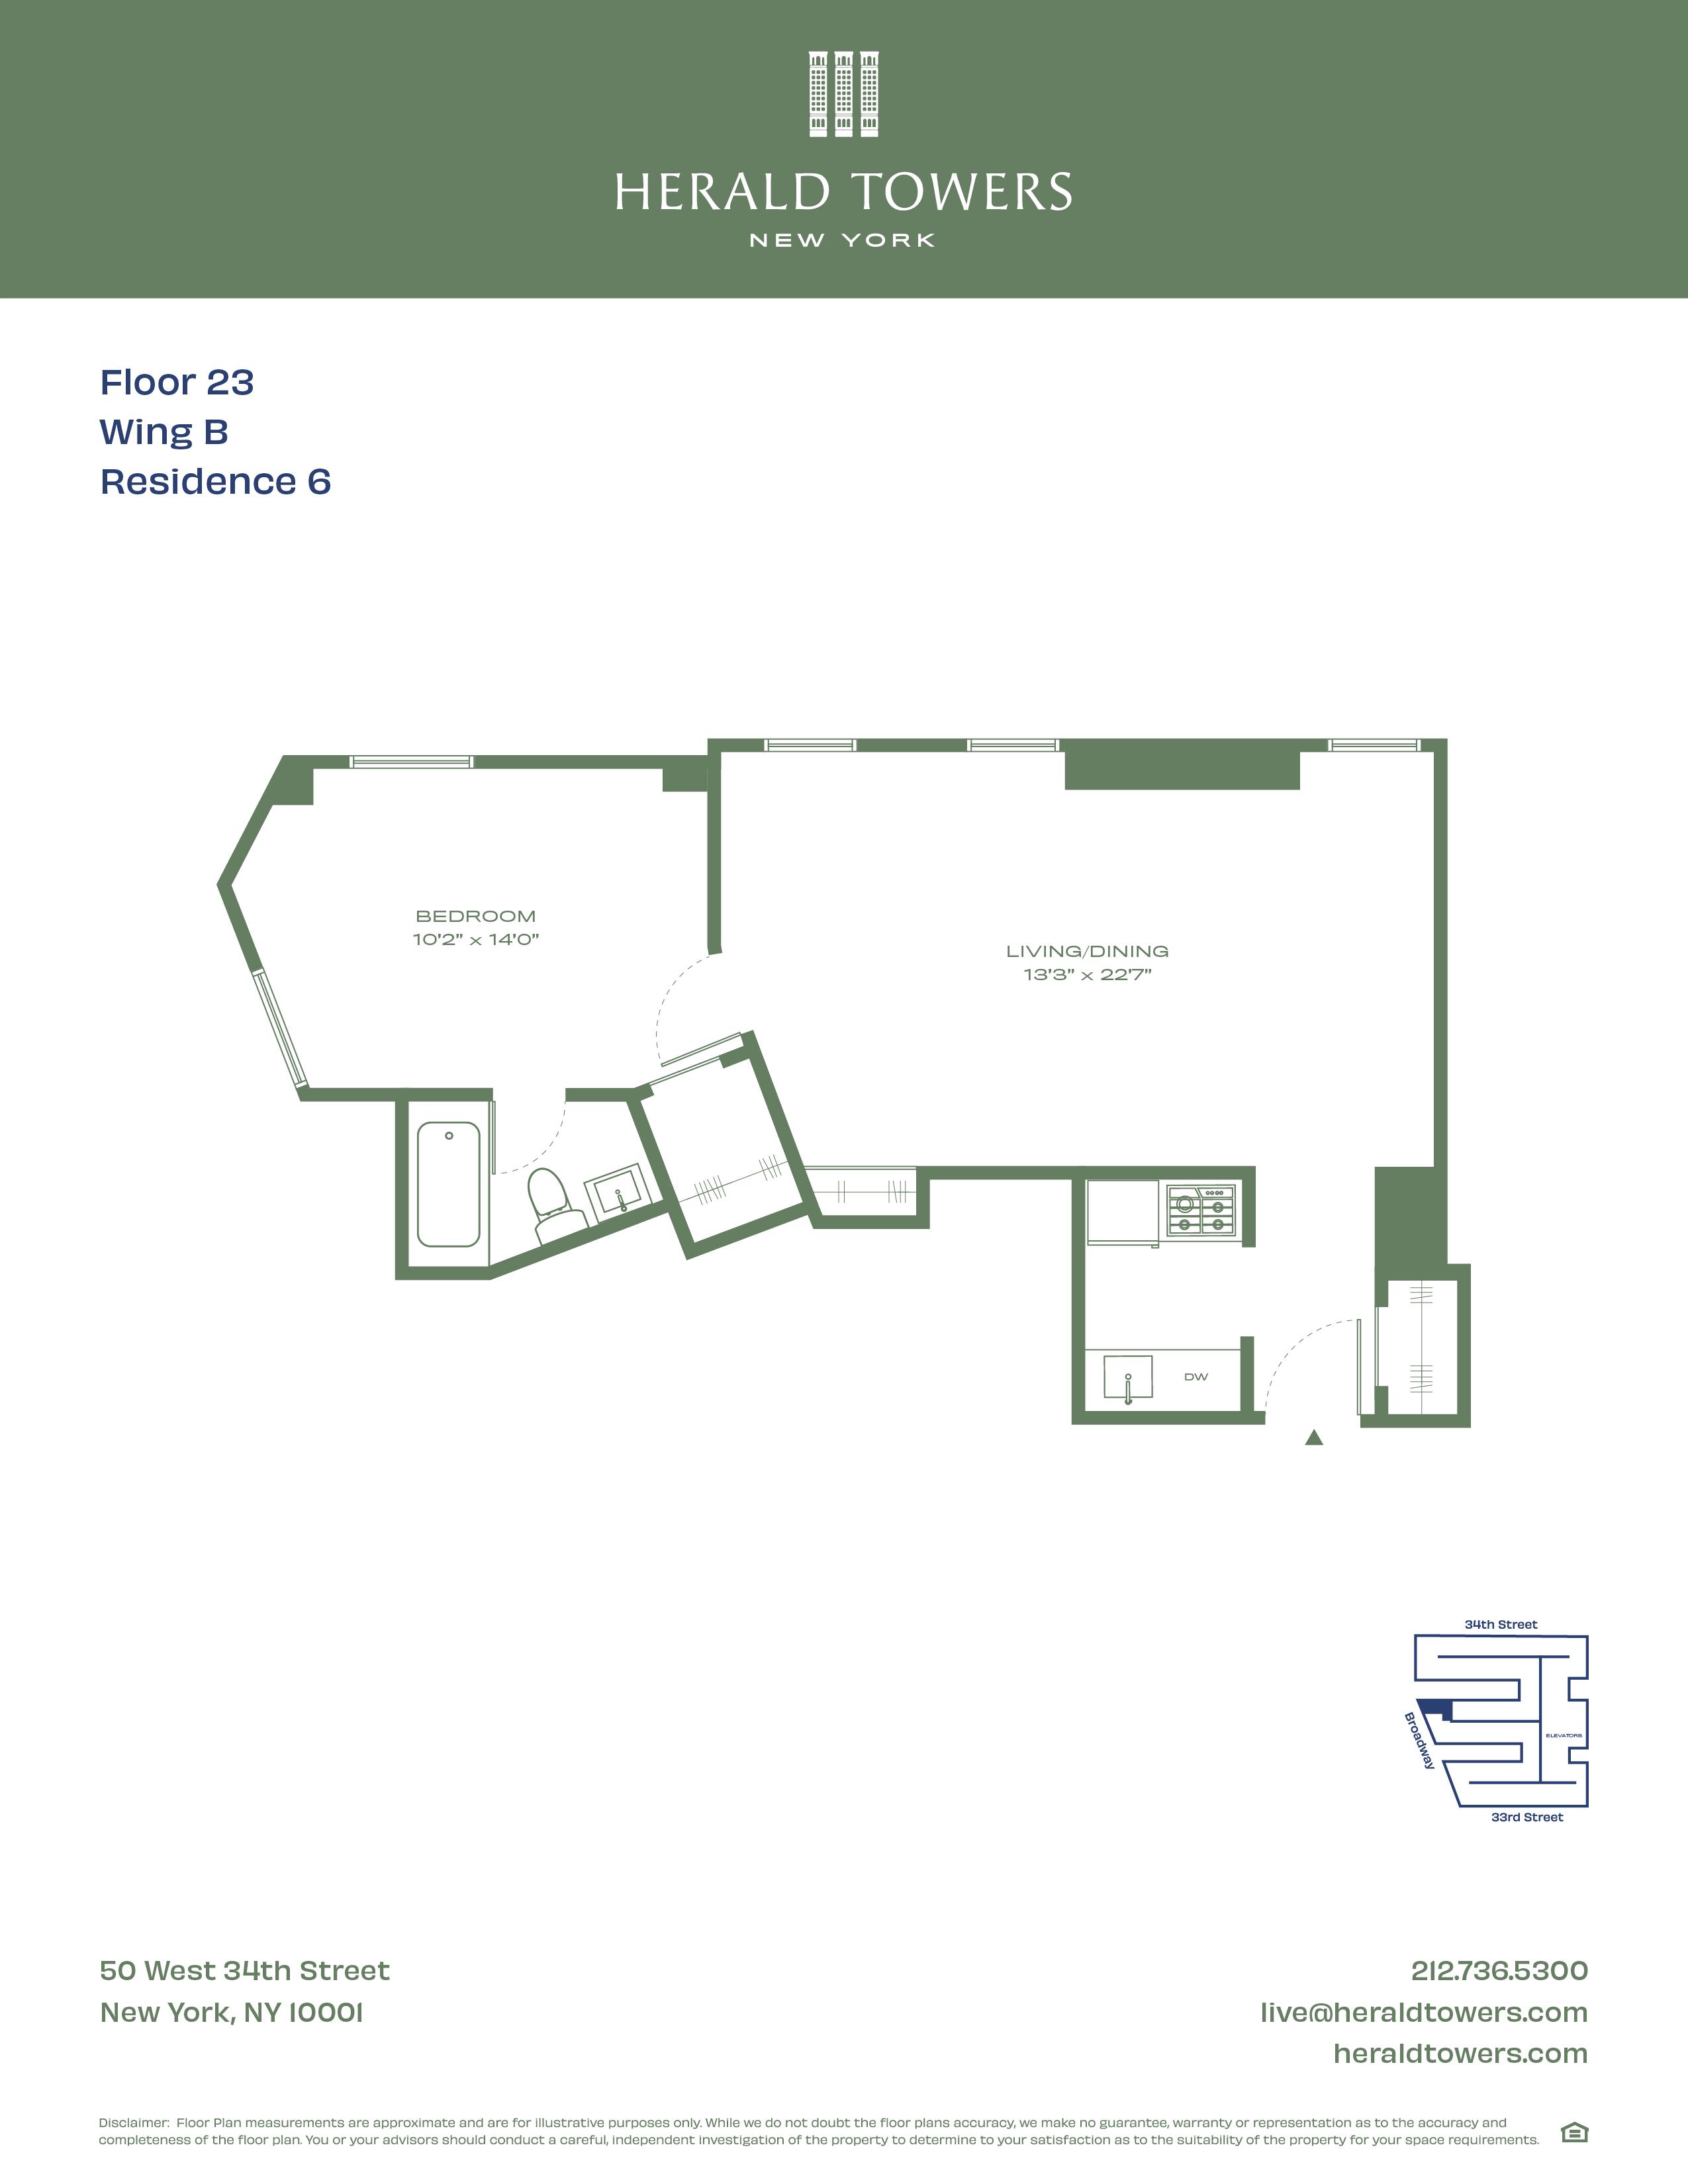 Floor plan for 23B06